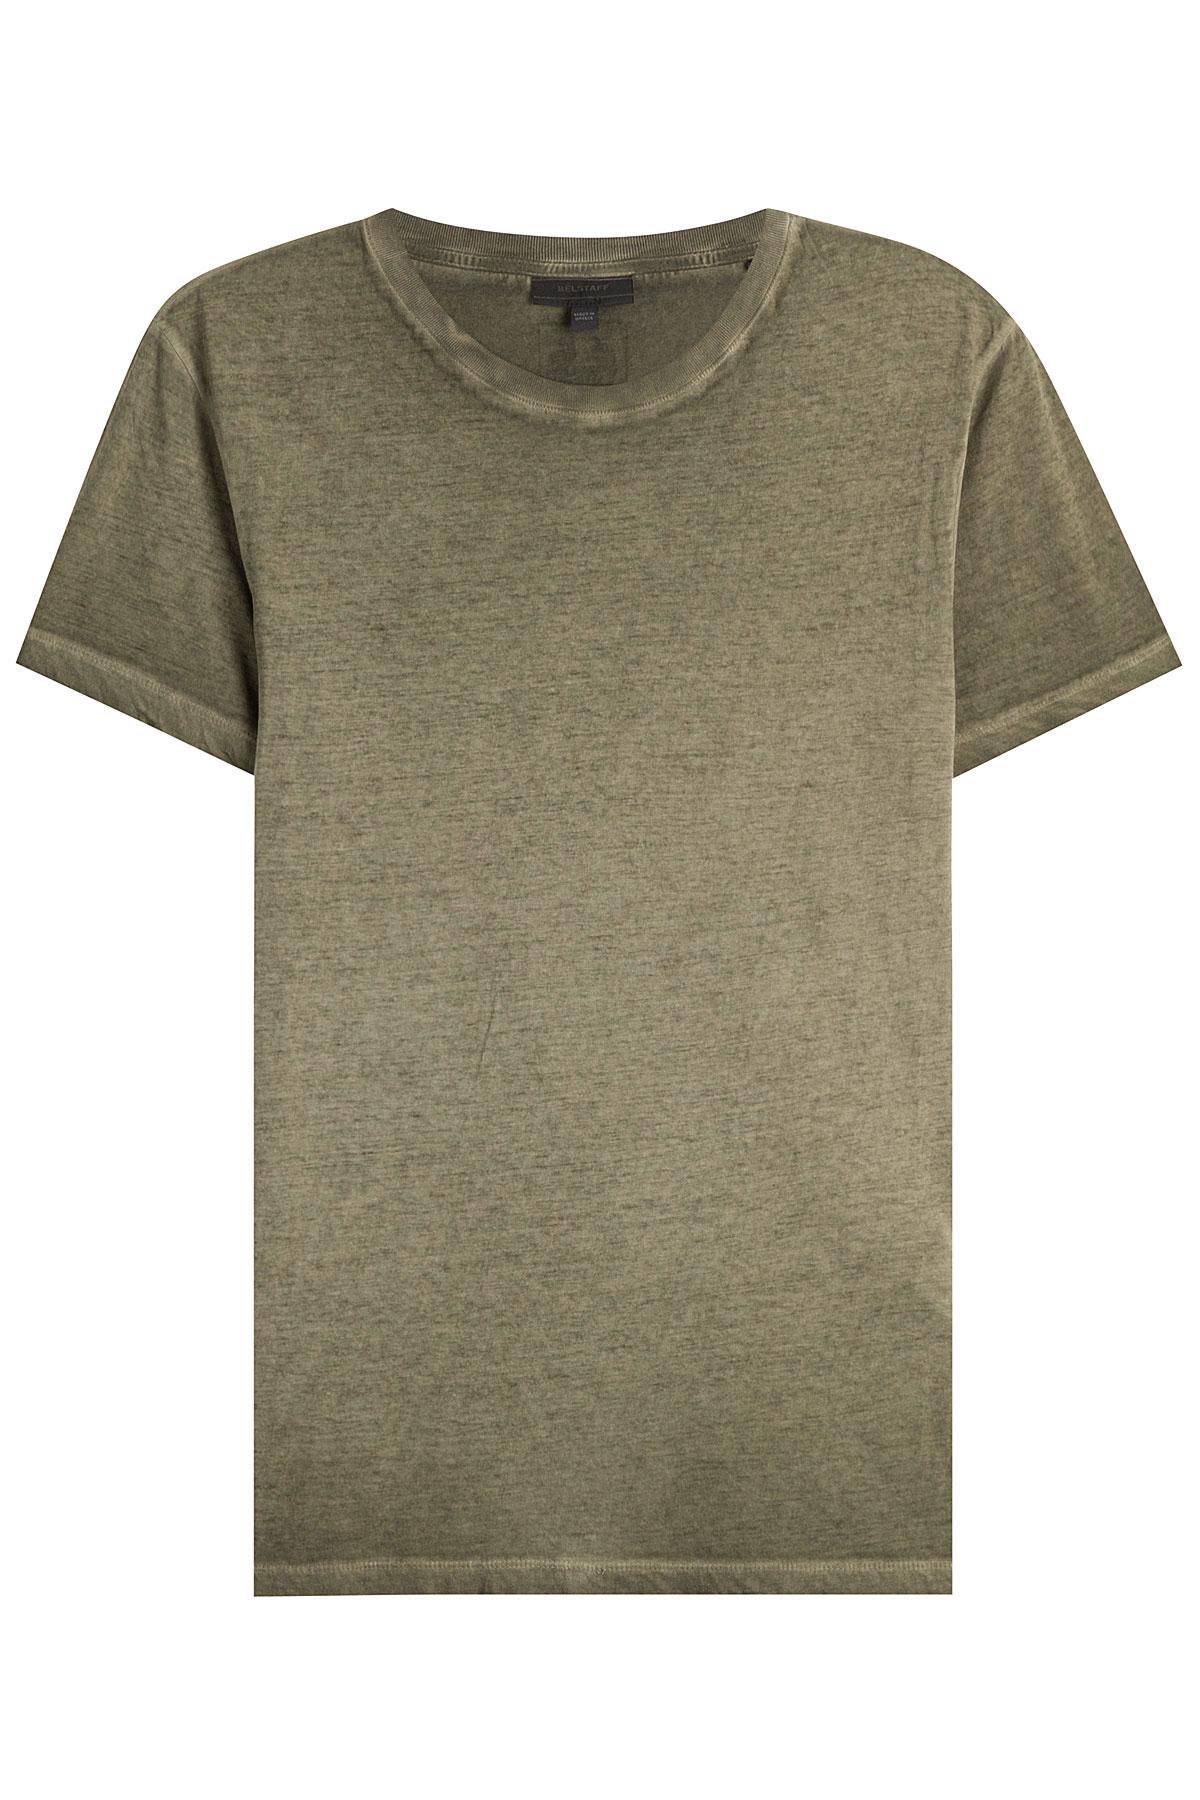 Basic military shirt from Belstaff